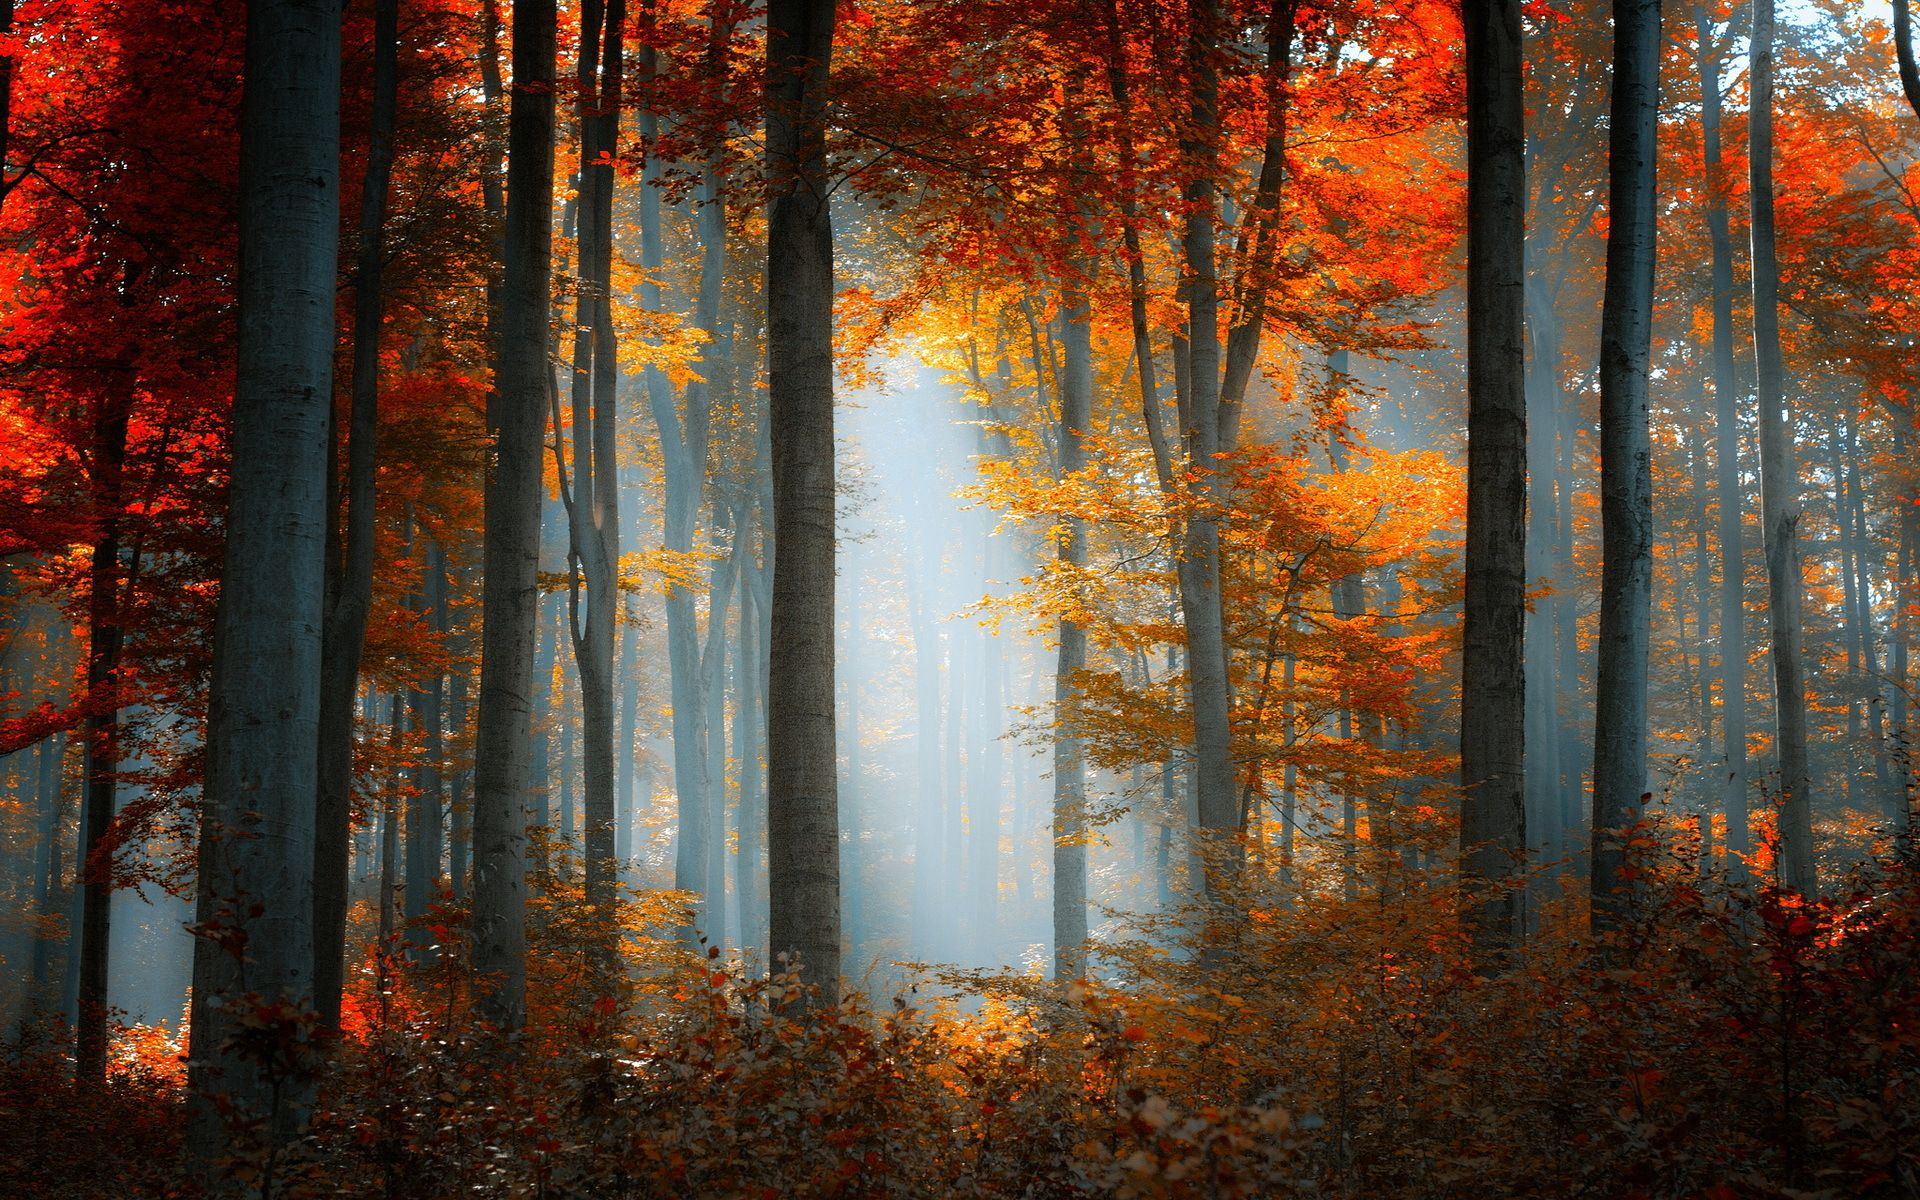 Dave Ruberto Autumn Fall Forest Nature Landscape Natureza Belas Paisagens Lindas Imagens